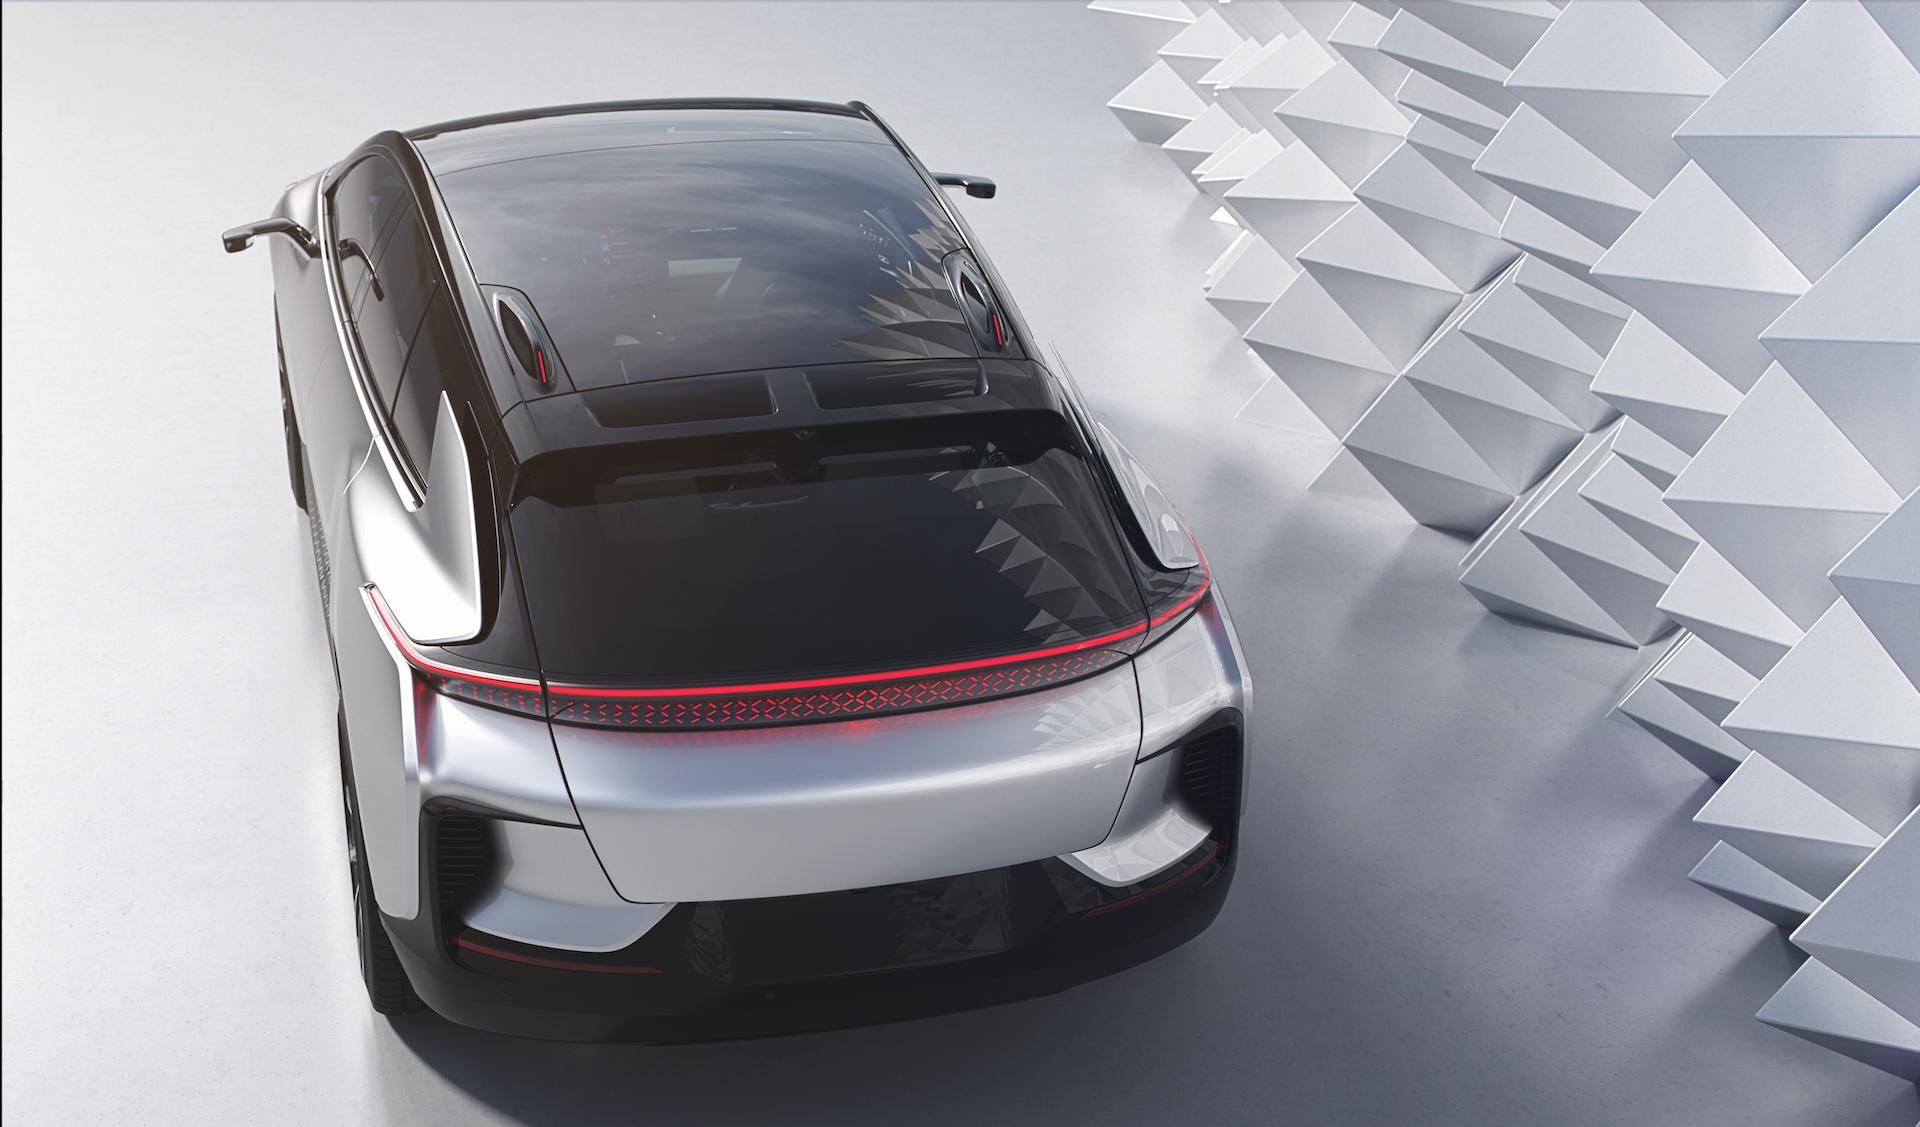 2018 Subaru Wrx And Wrx Sti Faraday Future Ff 91 2020 Audi Q8 The